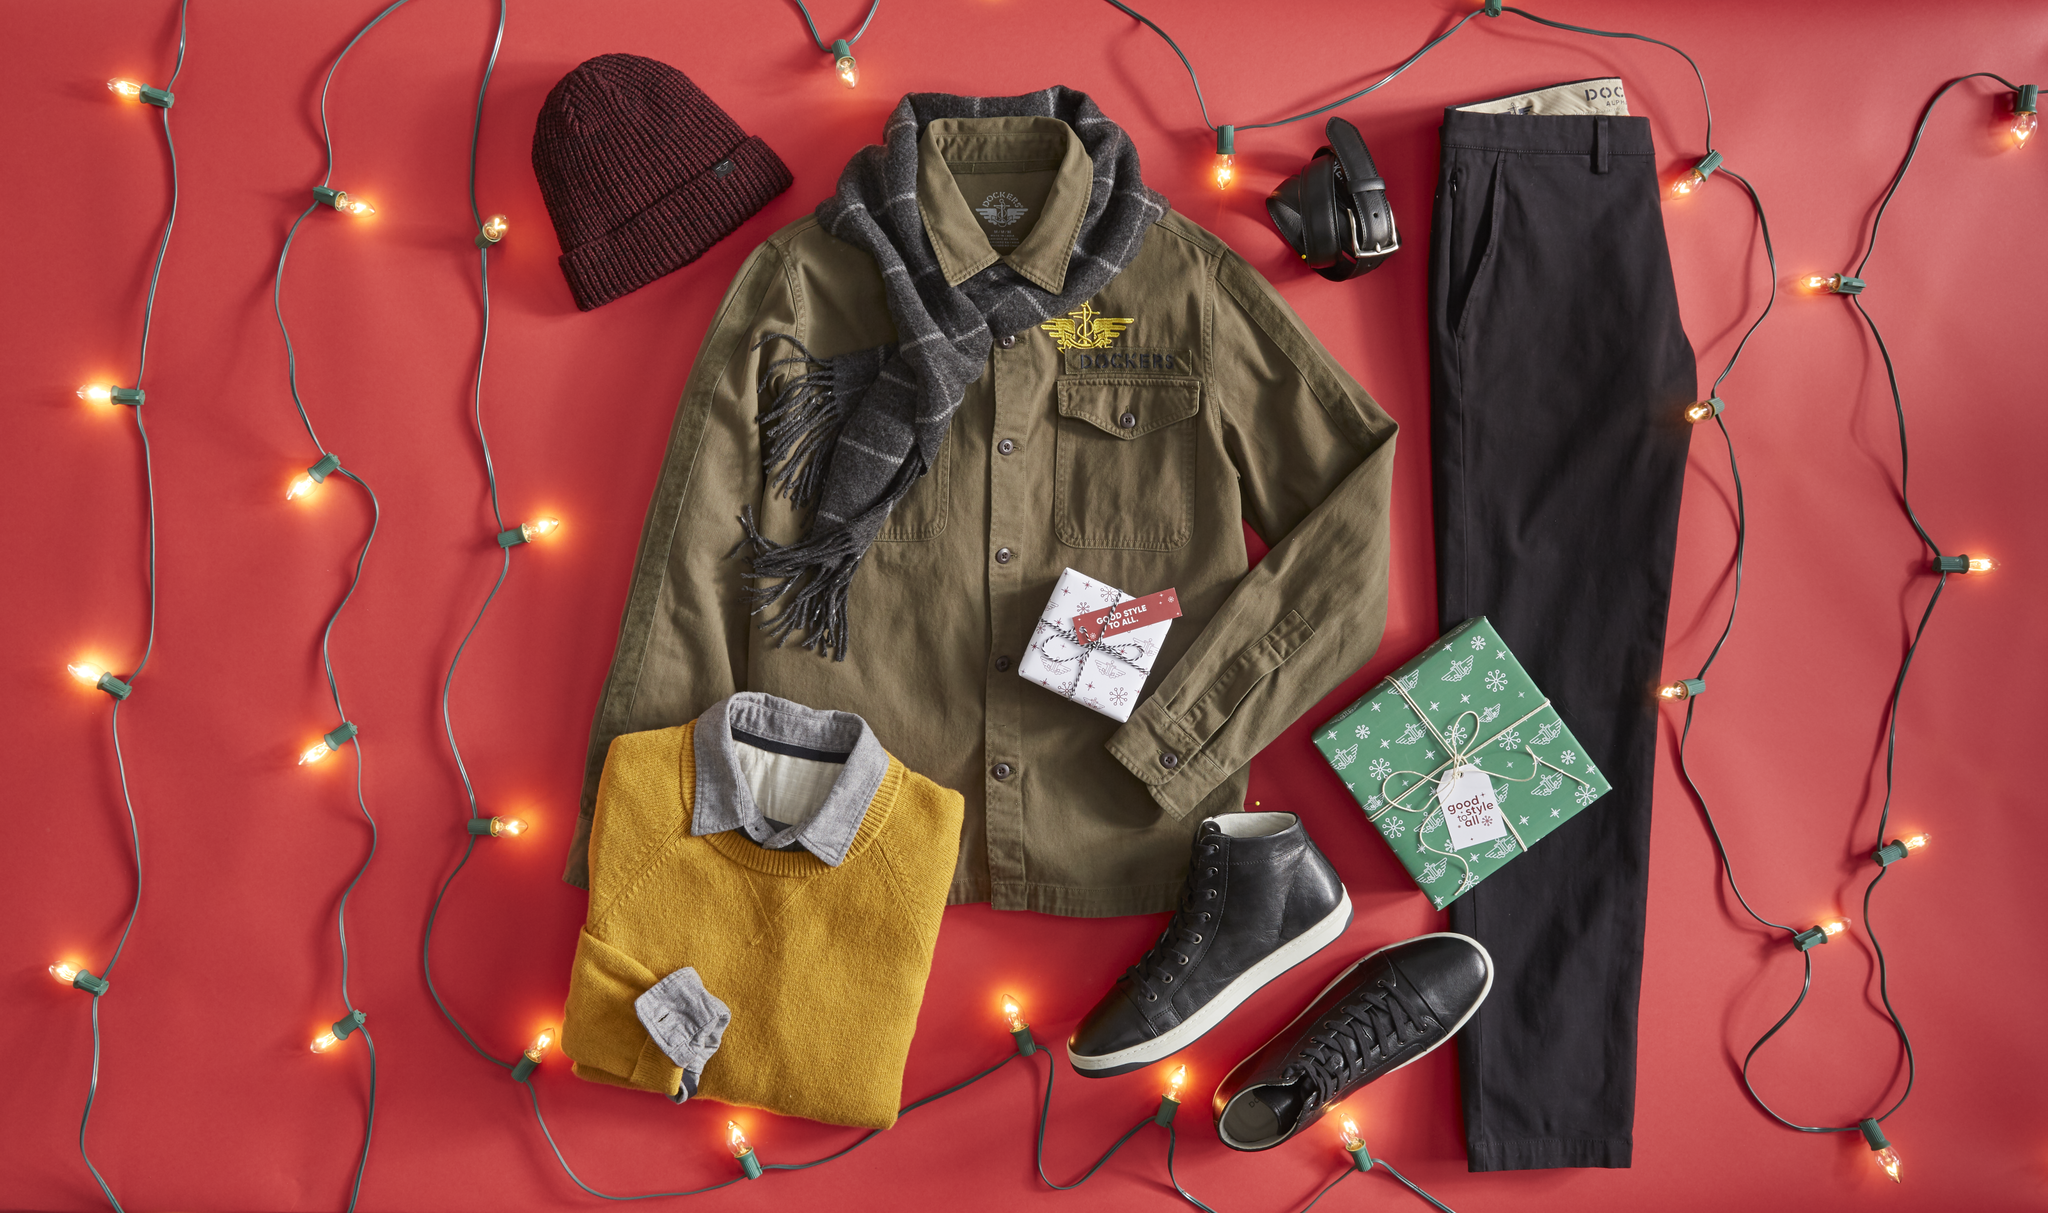 Docker's Holiday Gift Guide